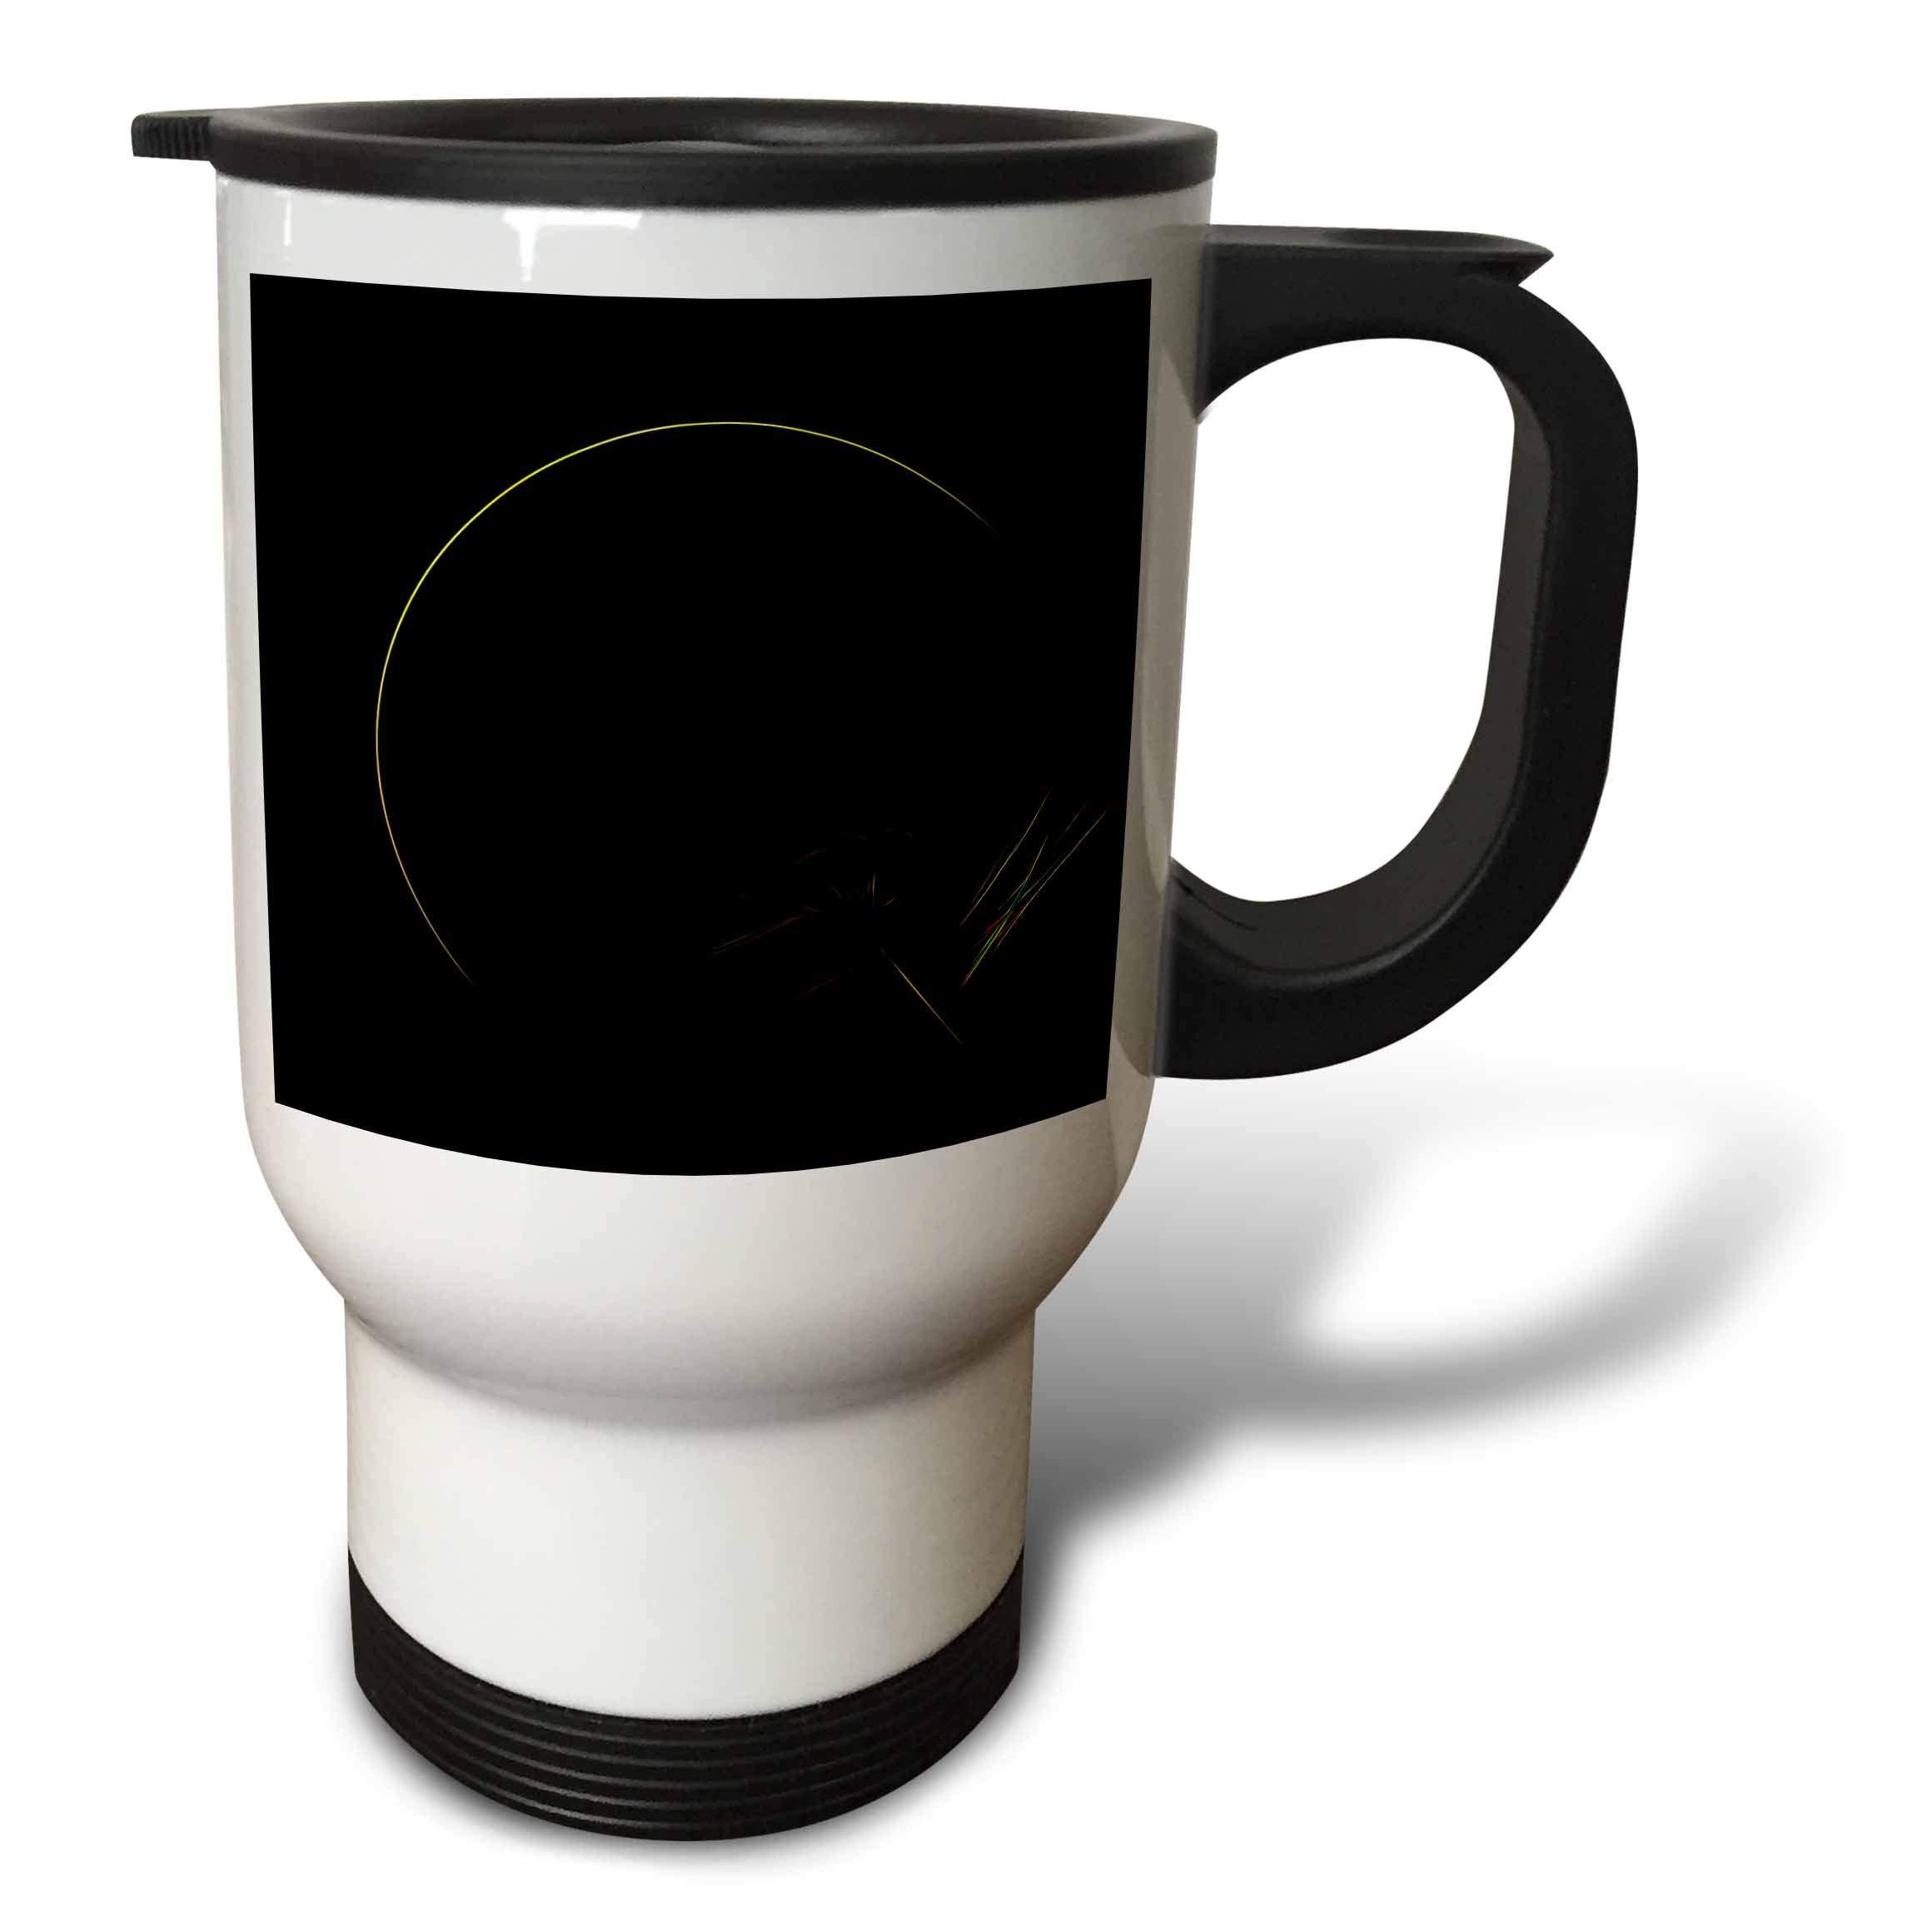 3dRose Digital Art by Brandi - Eclipse - Fractal abstract of a solar eclipse - 14oz Stainless Steel Travel Mug (tm_289203_1)